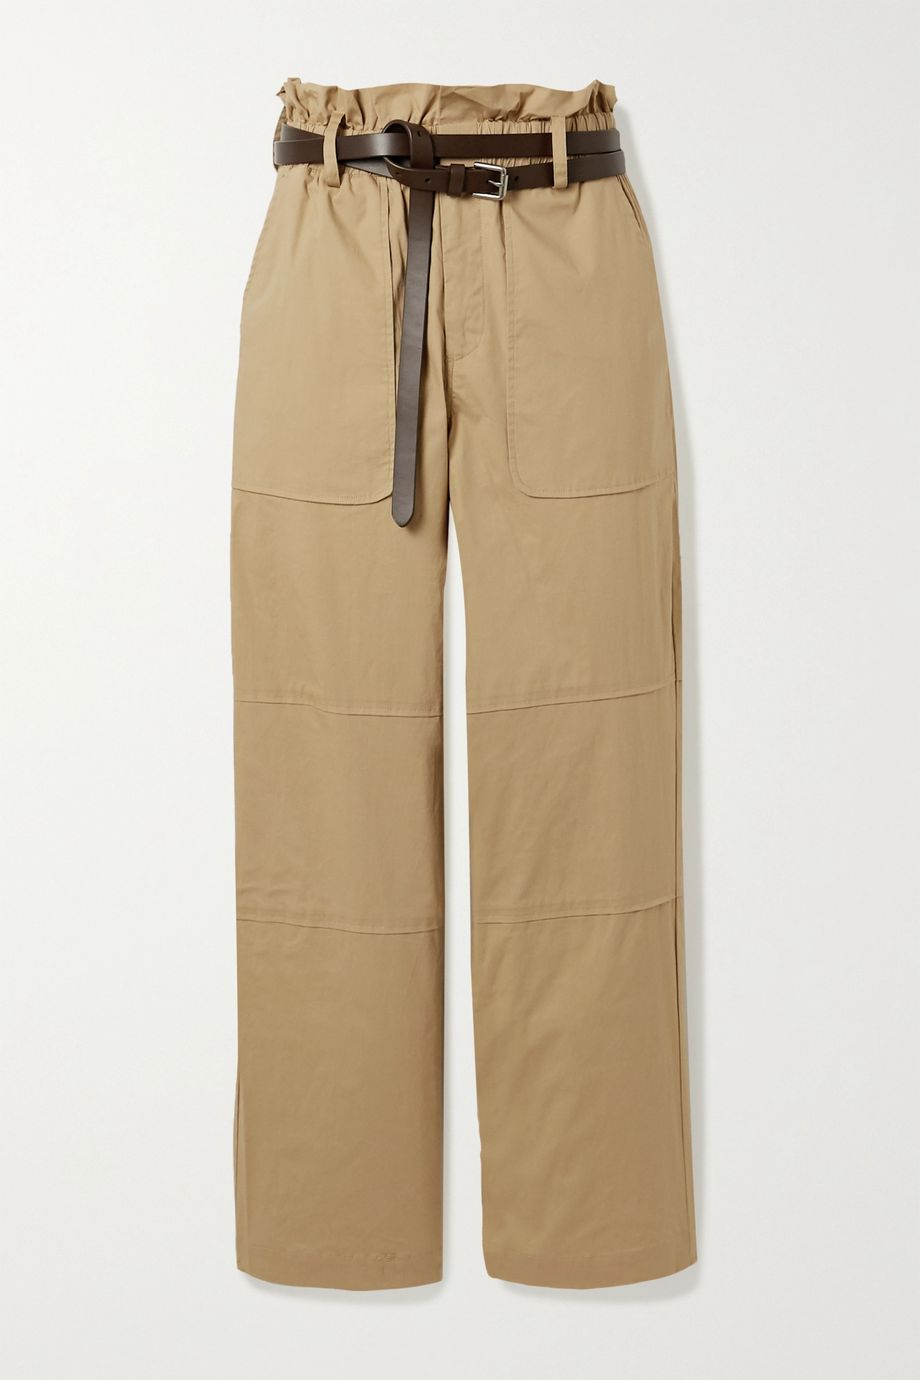 Sea Scott belted stretch-cotton cargo pants